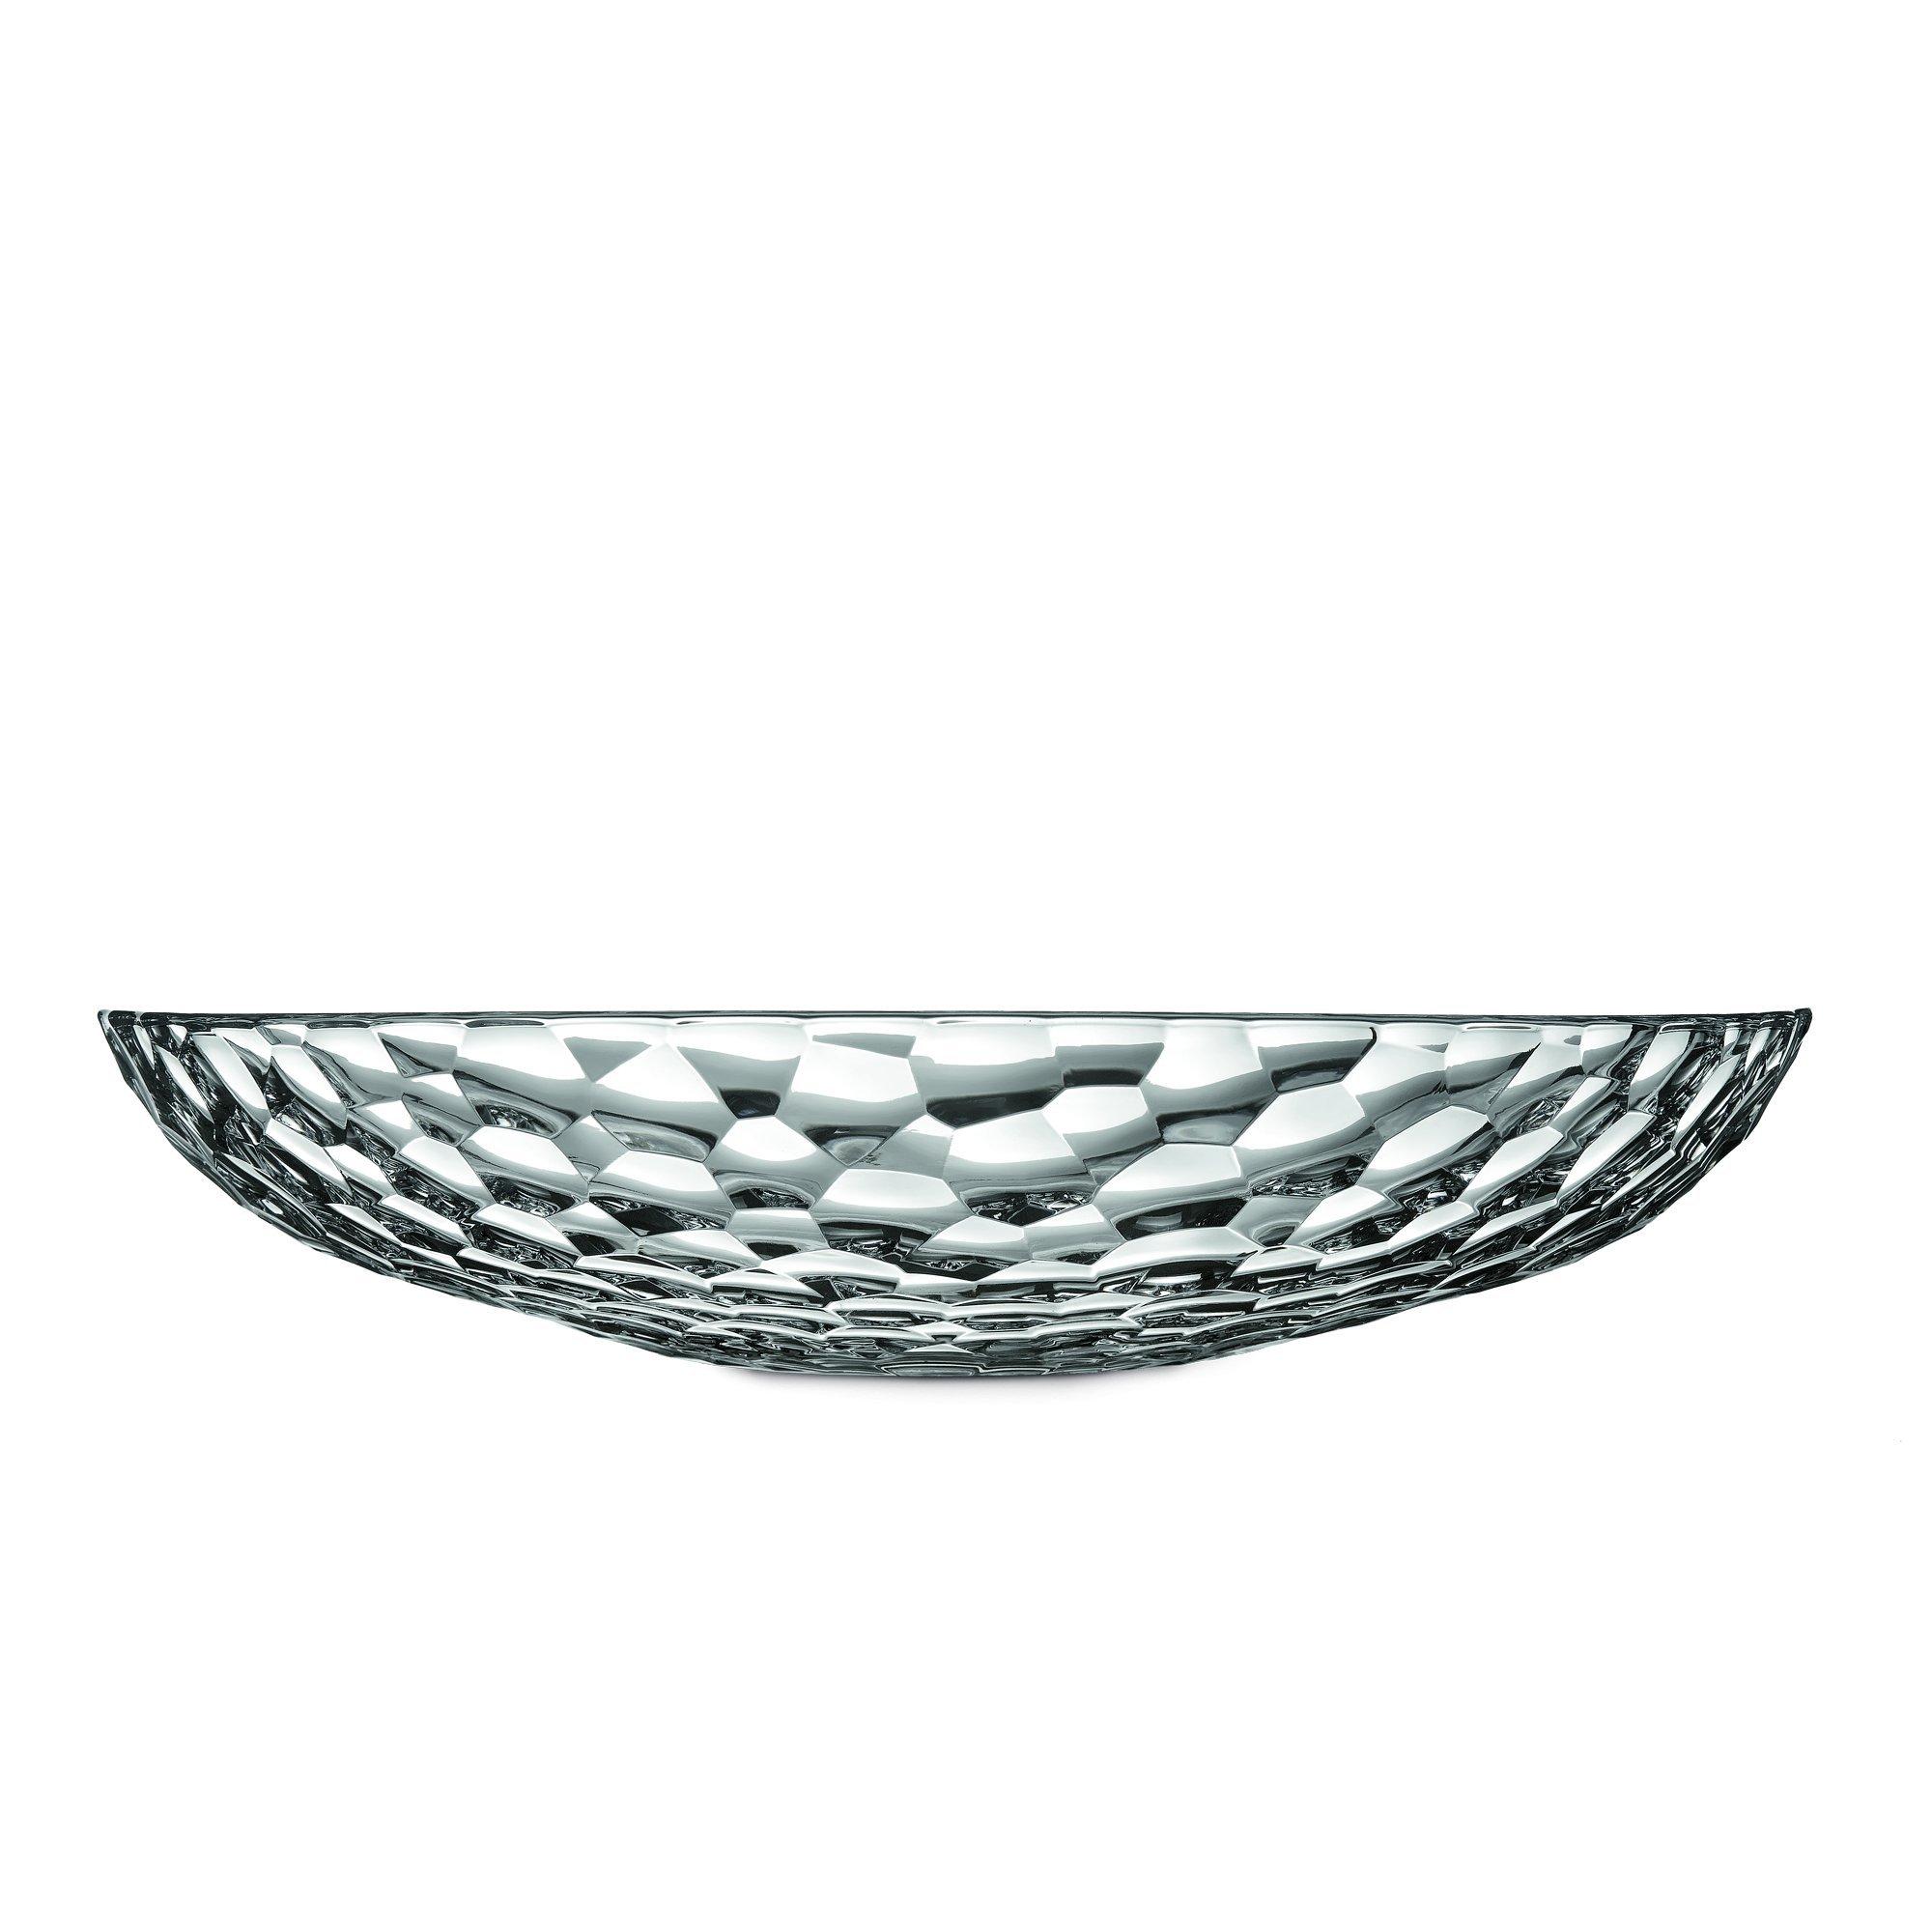 Vera Wang Sequin Centerpiece Bowl by Vera Wang